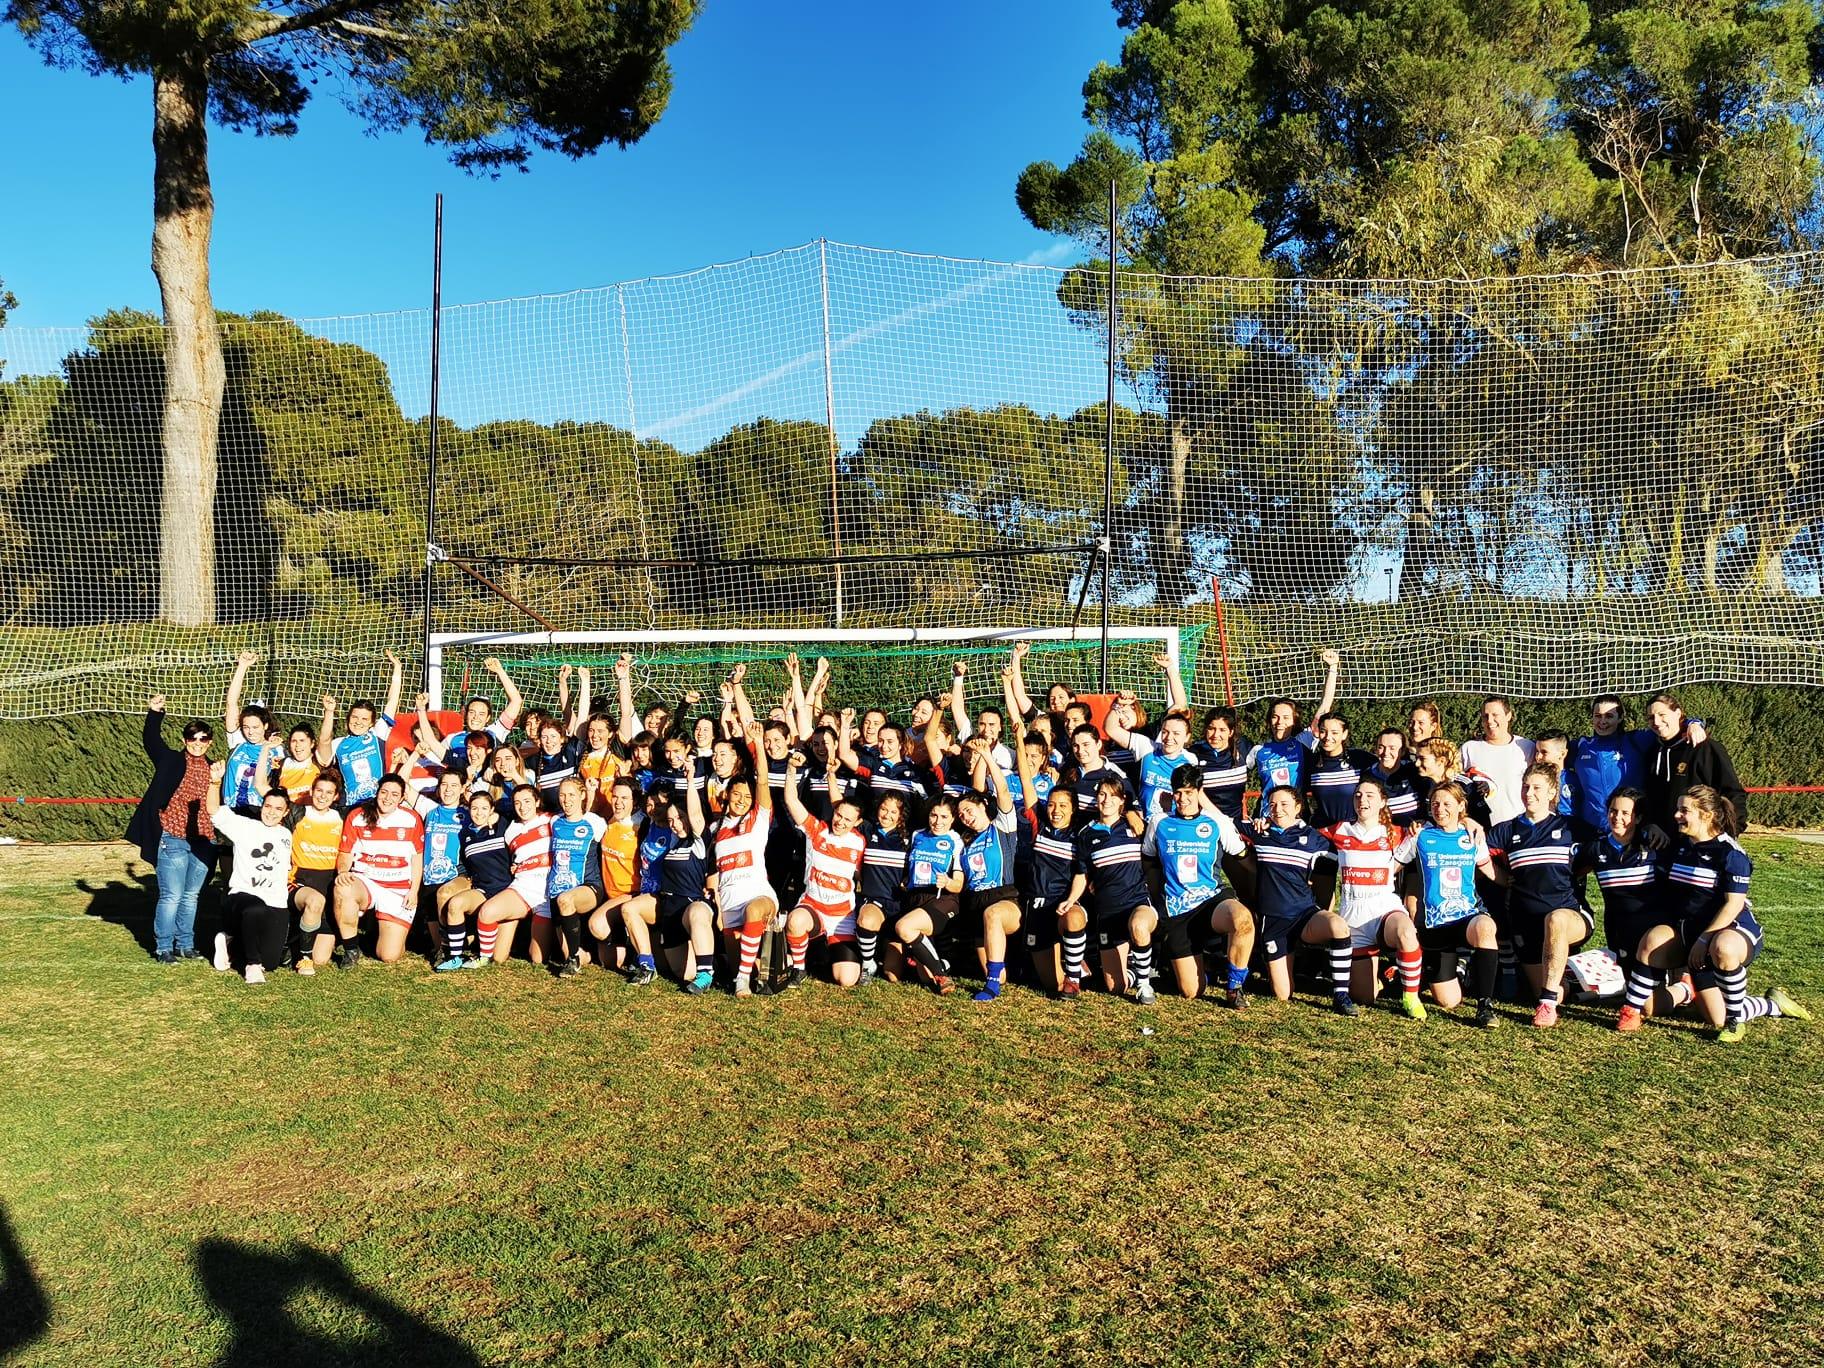 Liga aragonesa Masculino y Femenino Huesca - Fénix